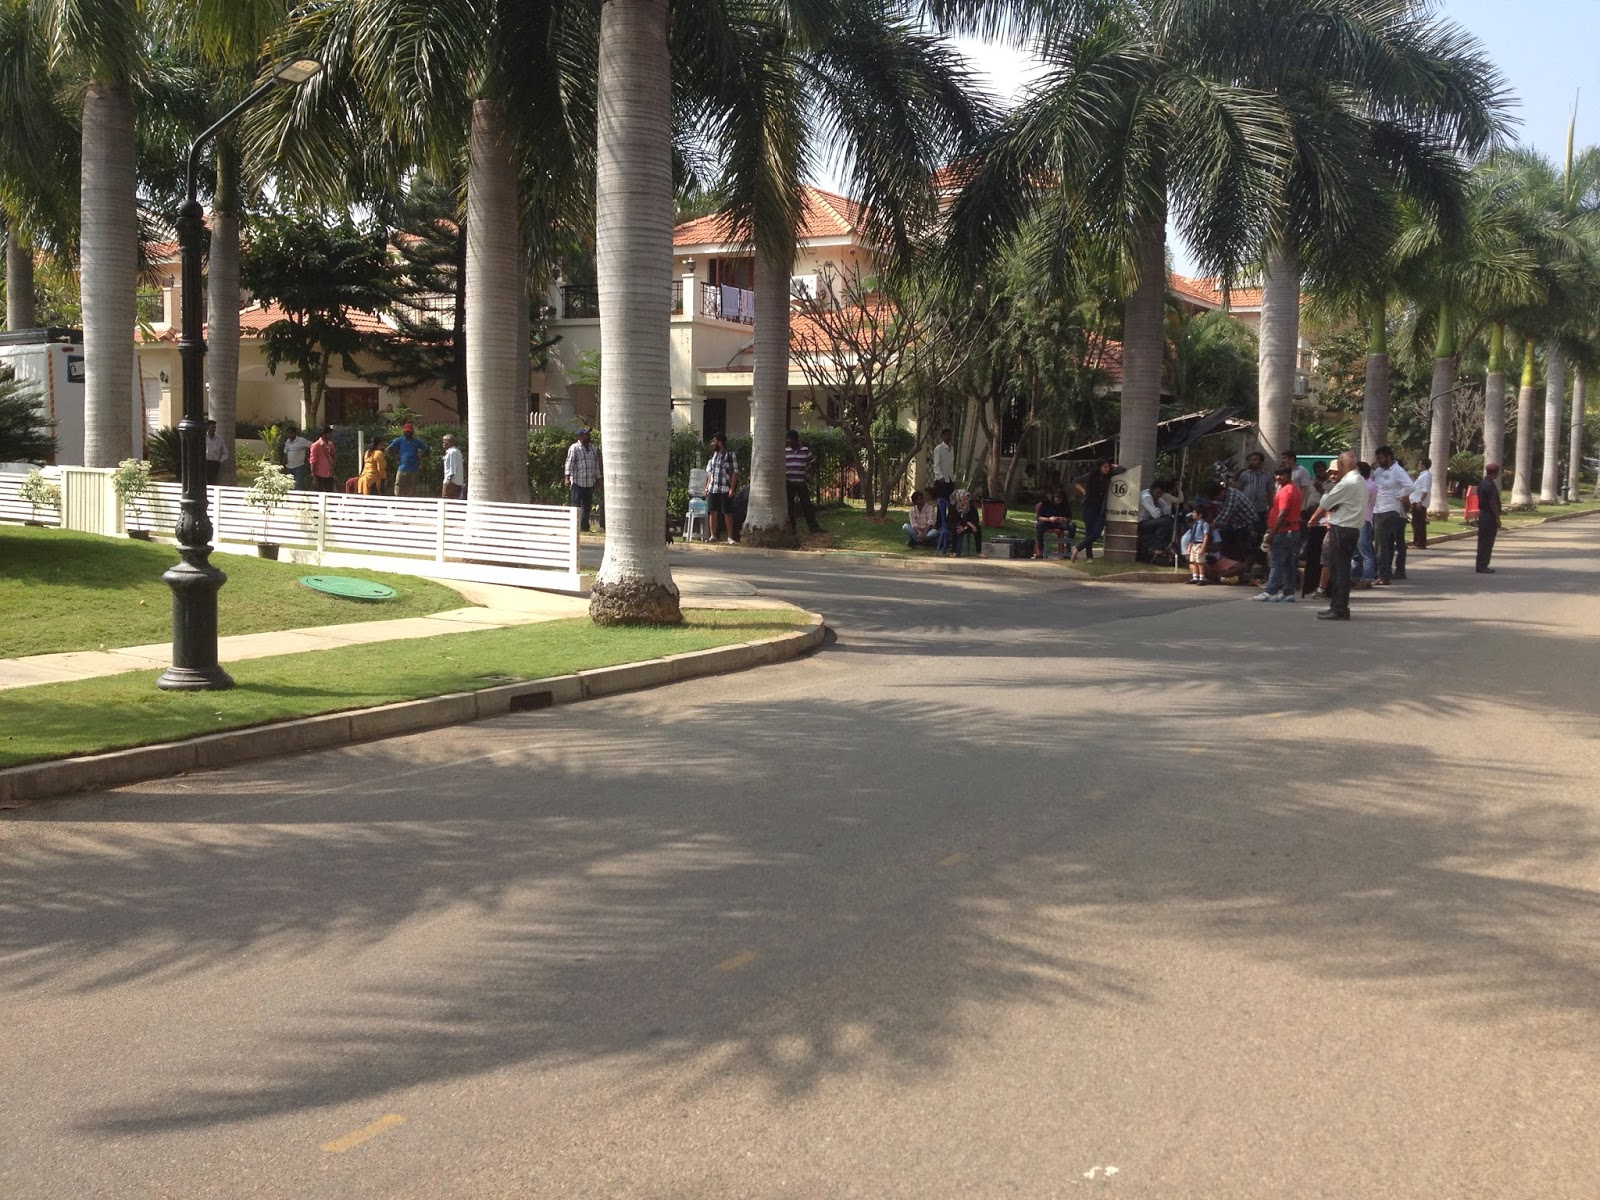 Johanssons Bangaloreäventyr: december 2013